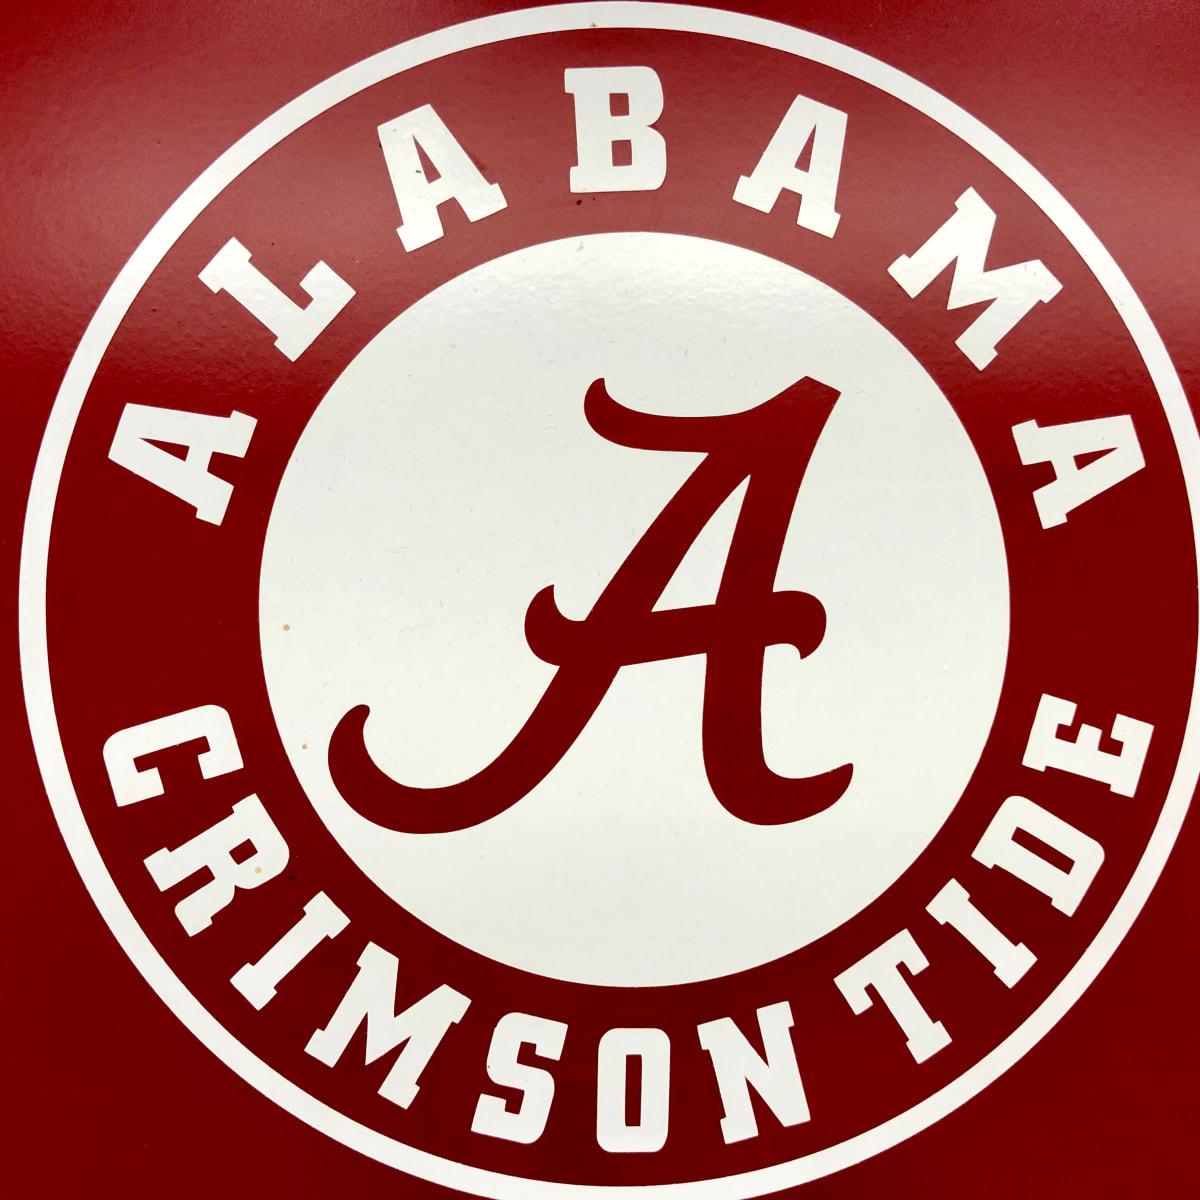 Alabama Football Program Record Apr Alabama Basketball Alabama Baseball Sports Illustrated Alabama Crimson Tide News Analysis And More